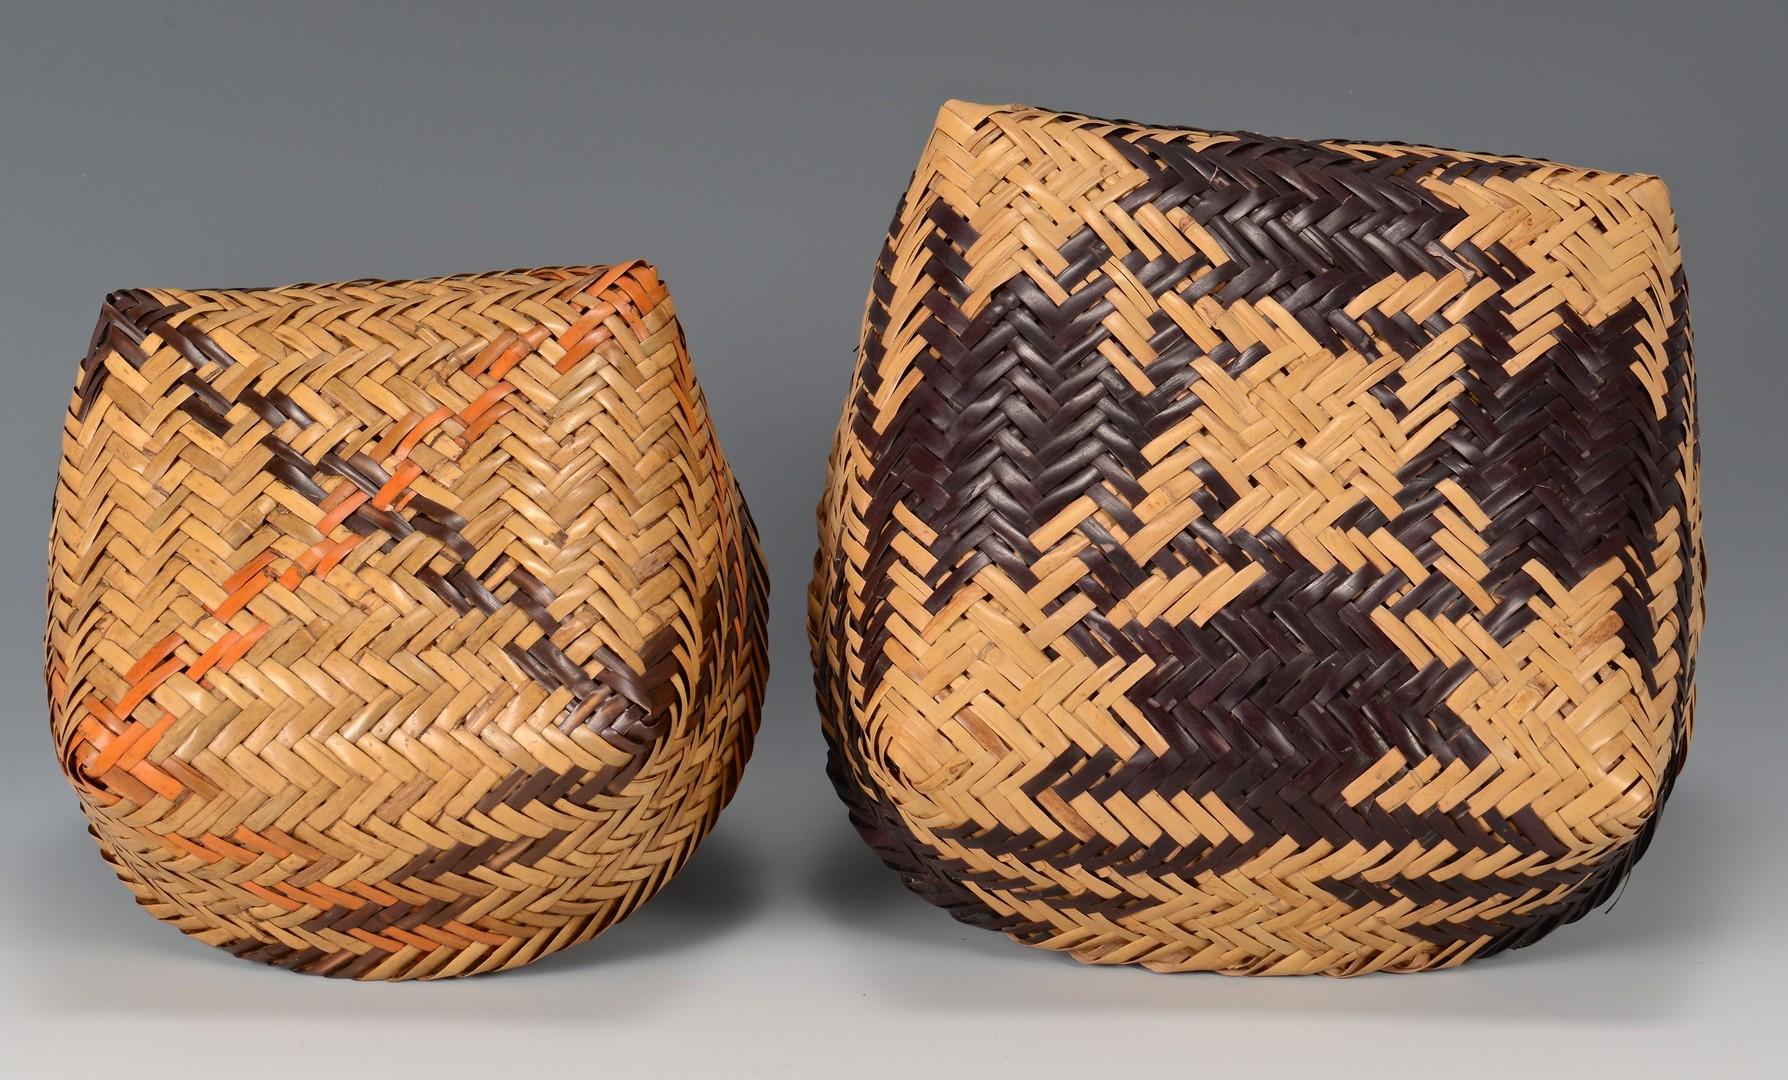 Lot 522: 2 Cherokee Double Weave Cane Baskets